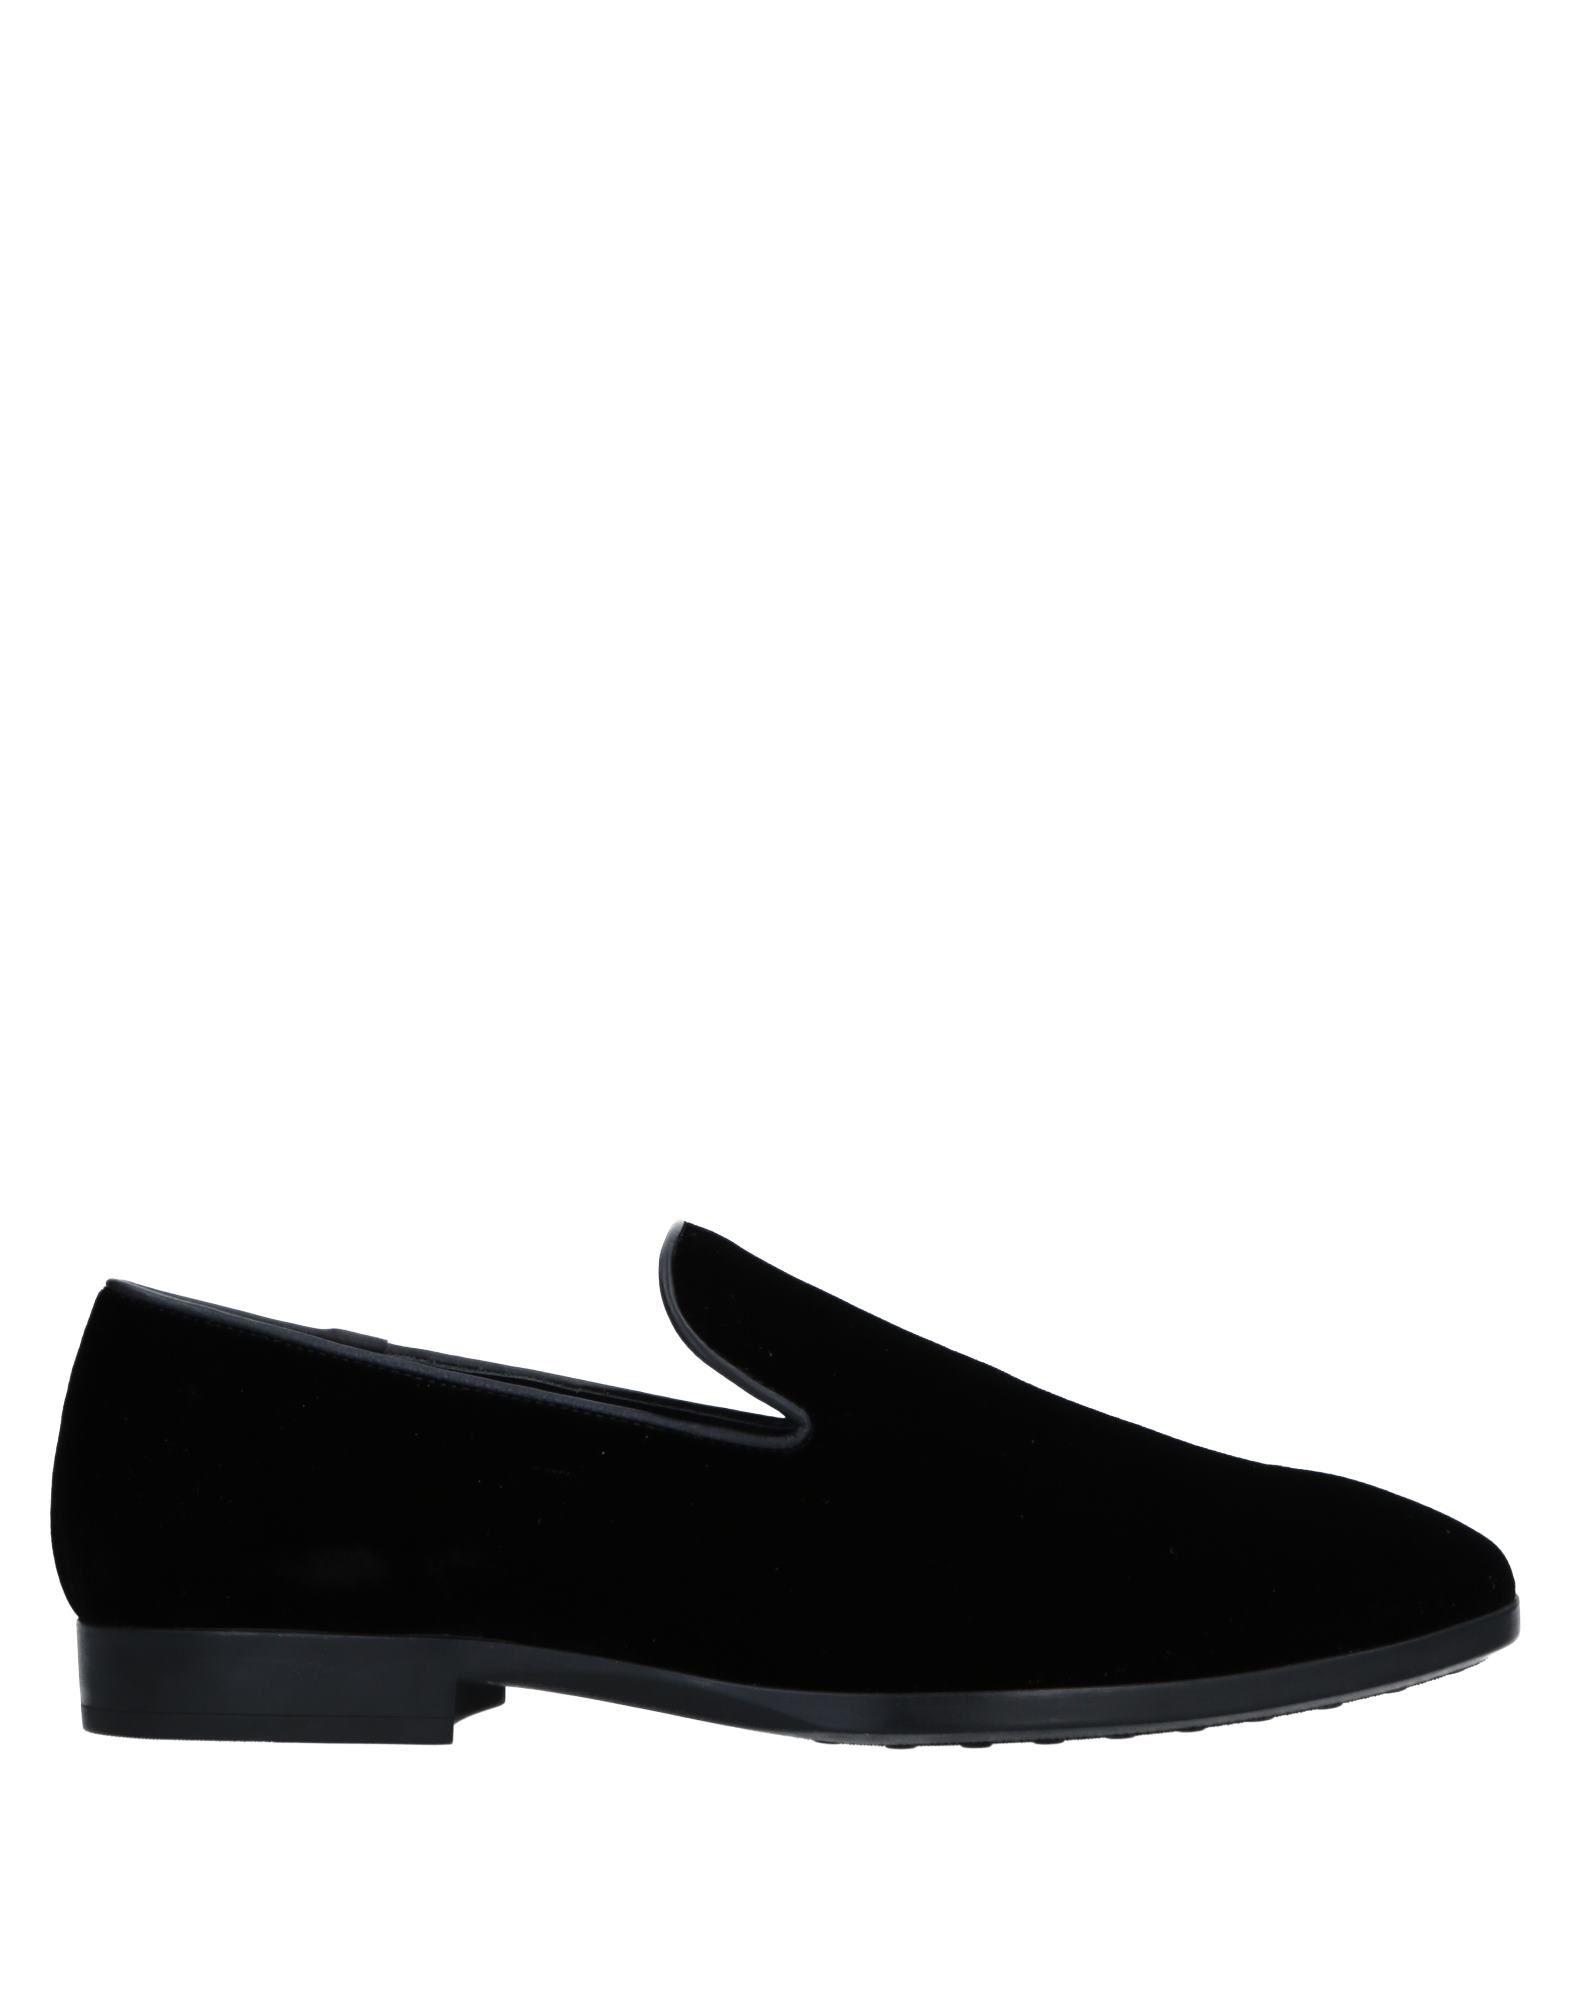 Tod's Mokassins Herren  11542447CX Gute Qualität beliebte Schuhe